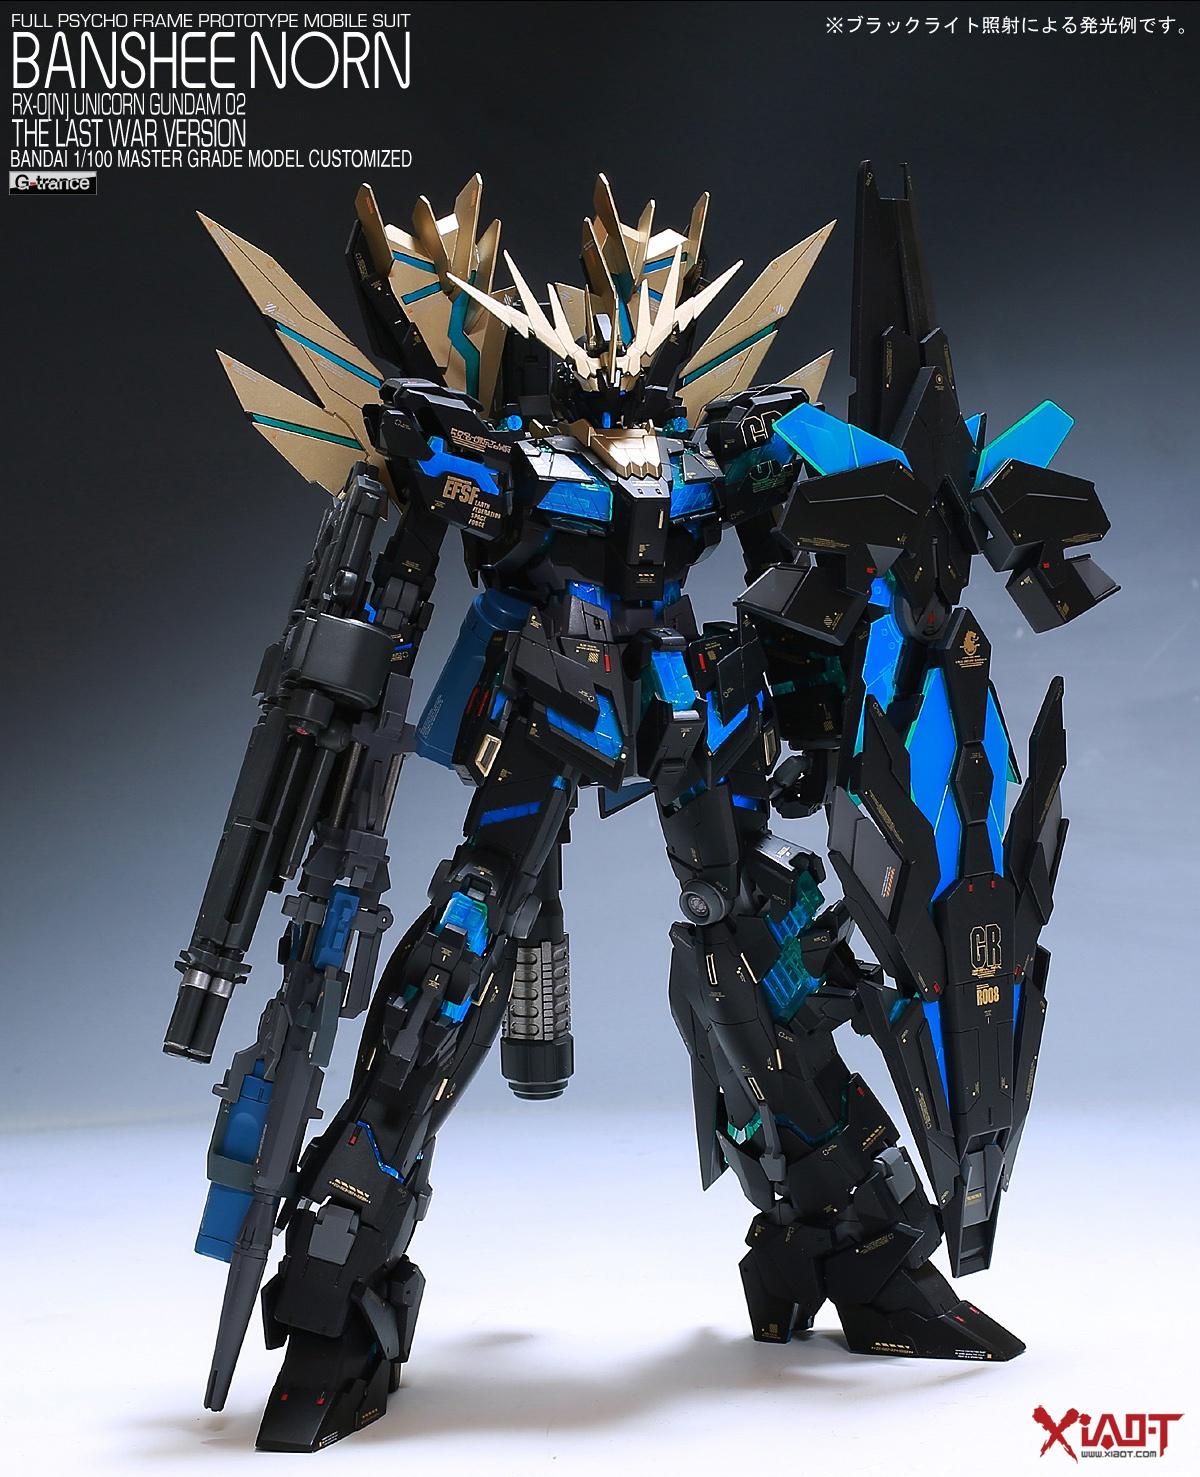 Custom Build Mg 1 100 Banshee Norn Detailed Gundam Kits